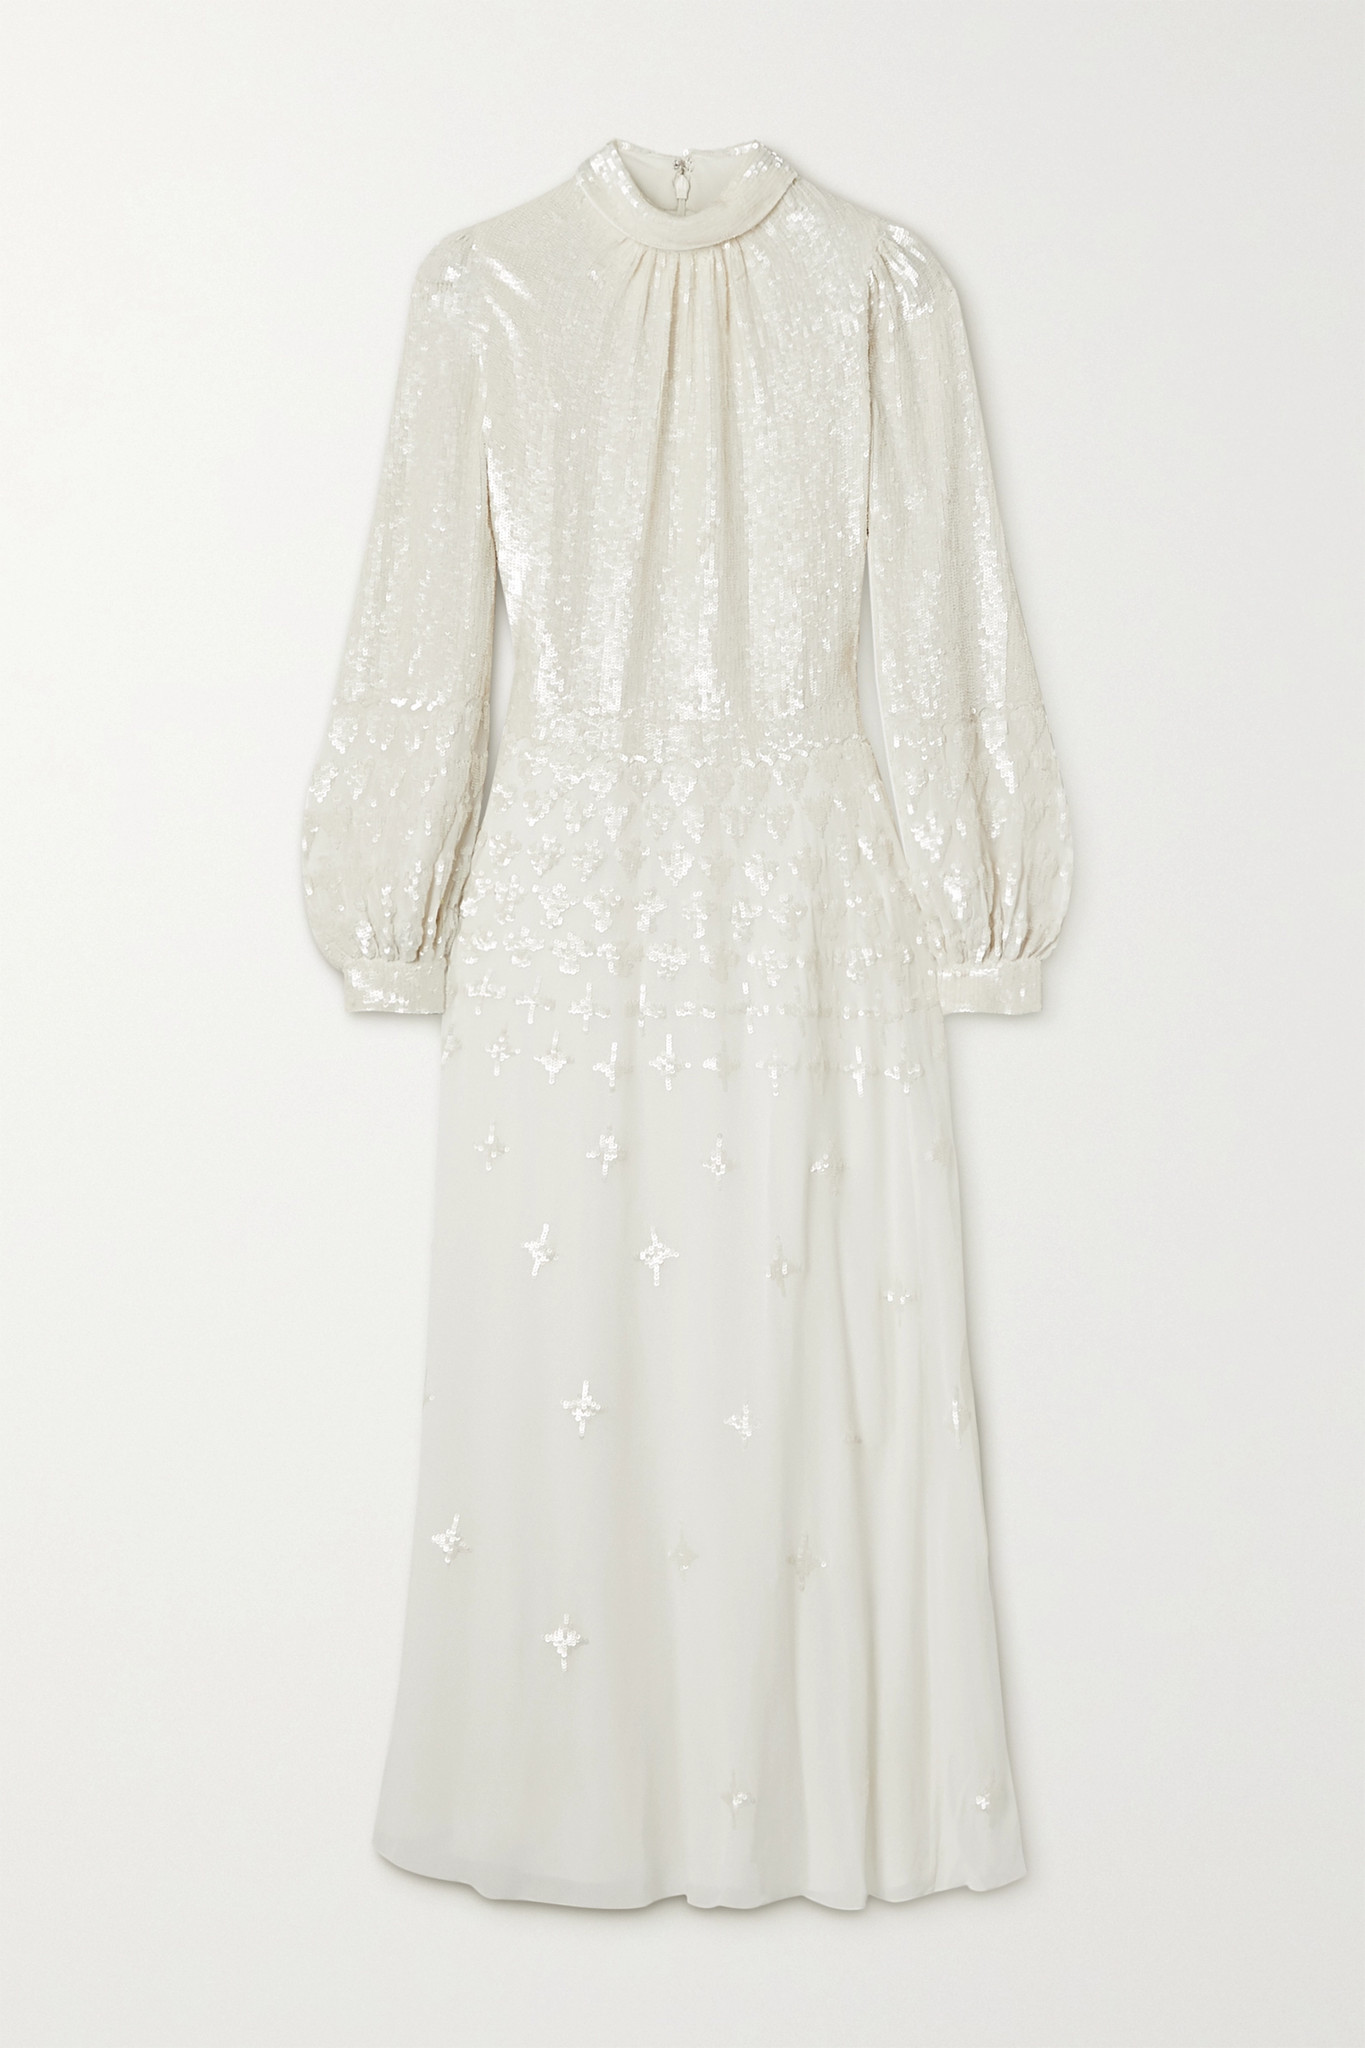 TEMPERLEY LONDON - Mirella Sequin-embellished Crepe De Chine Midi Dress - Off-white - UK12